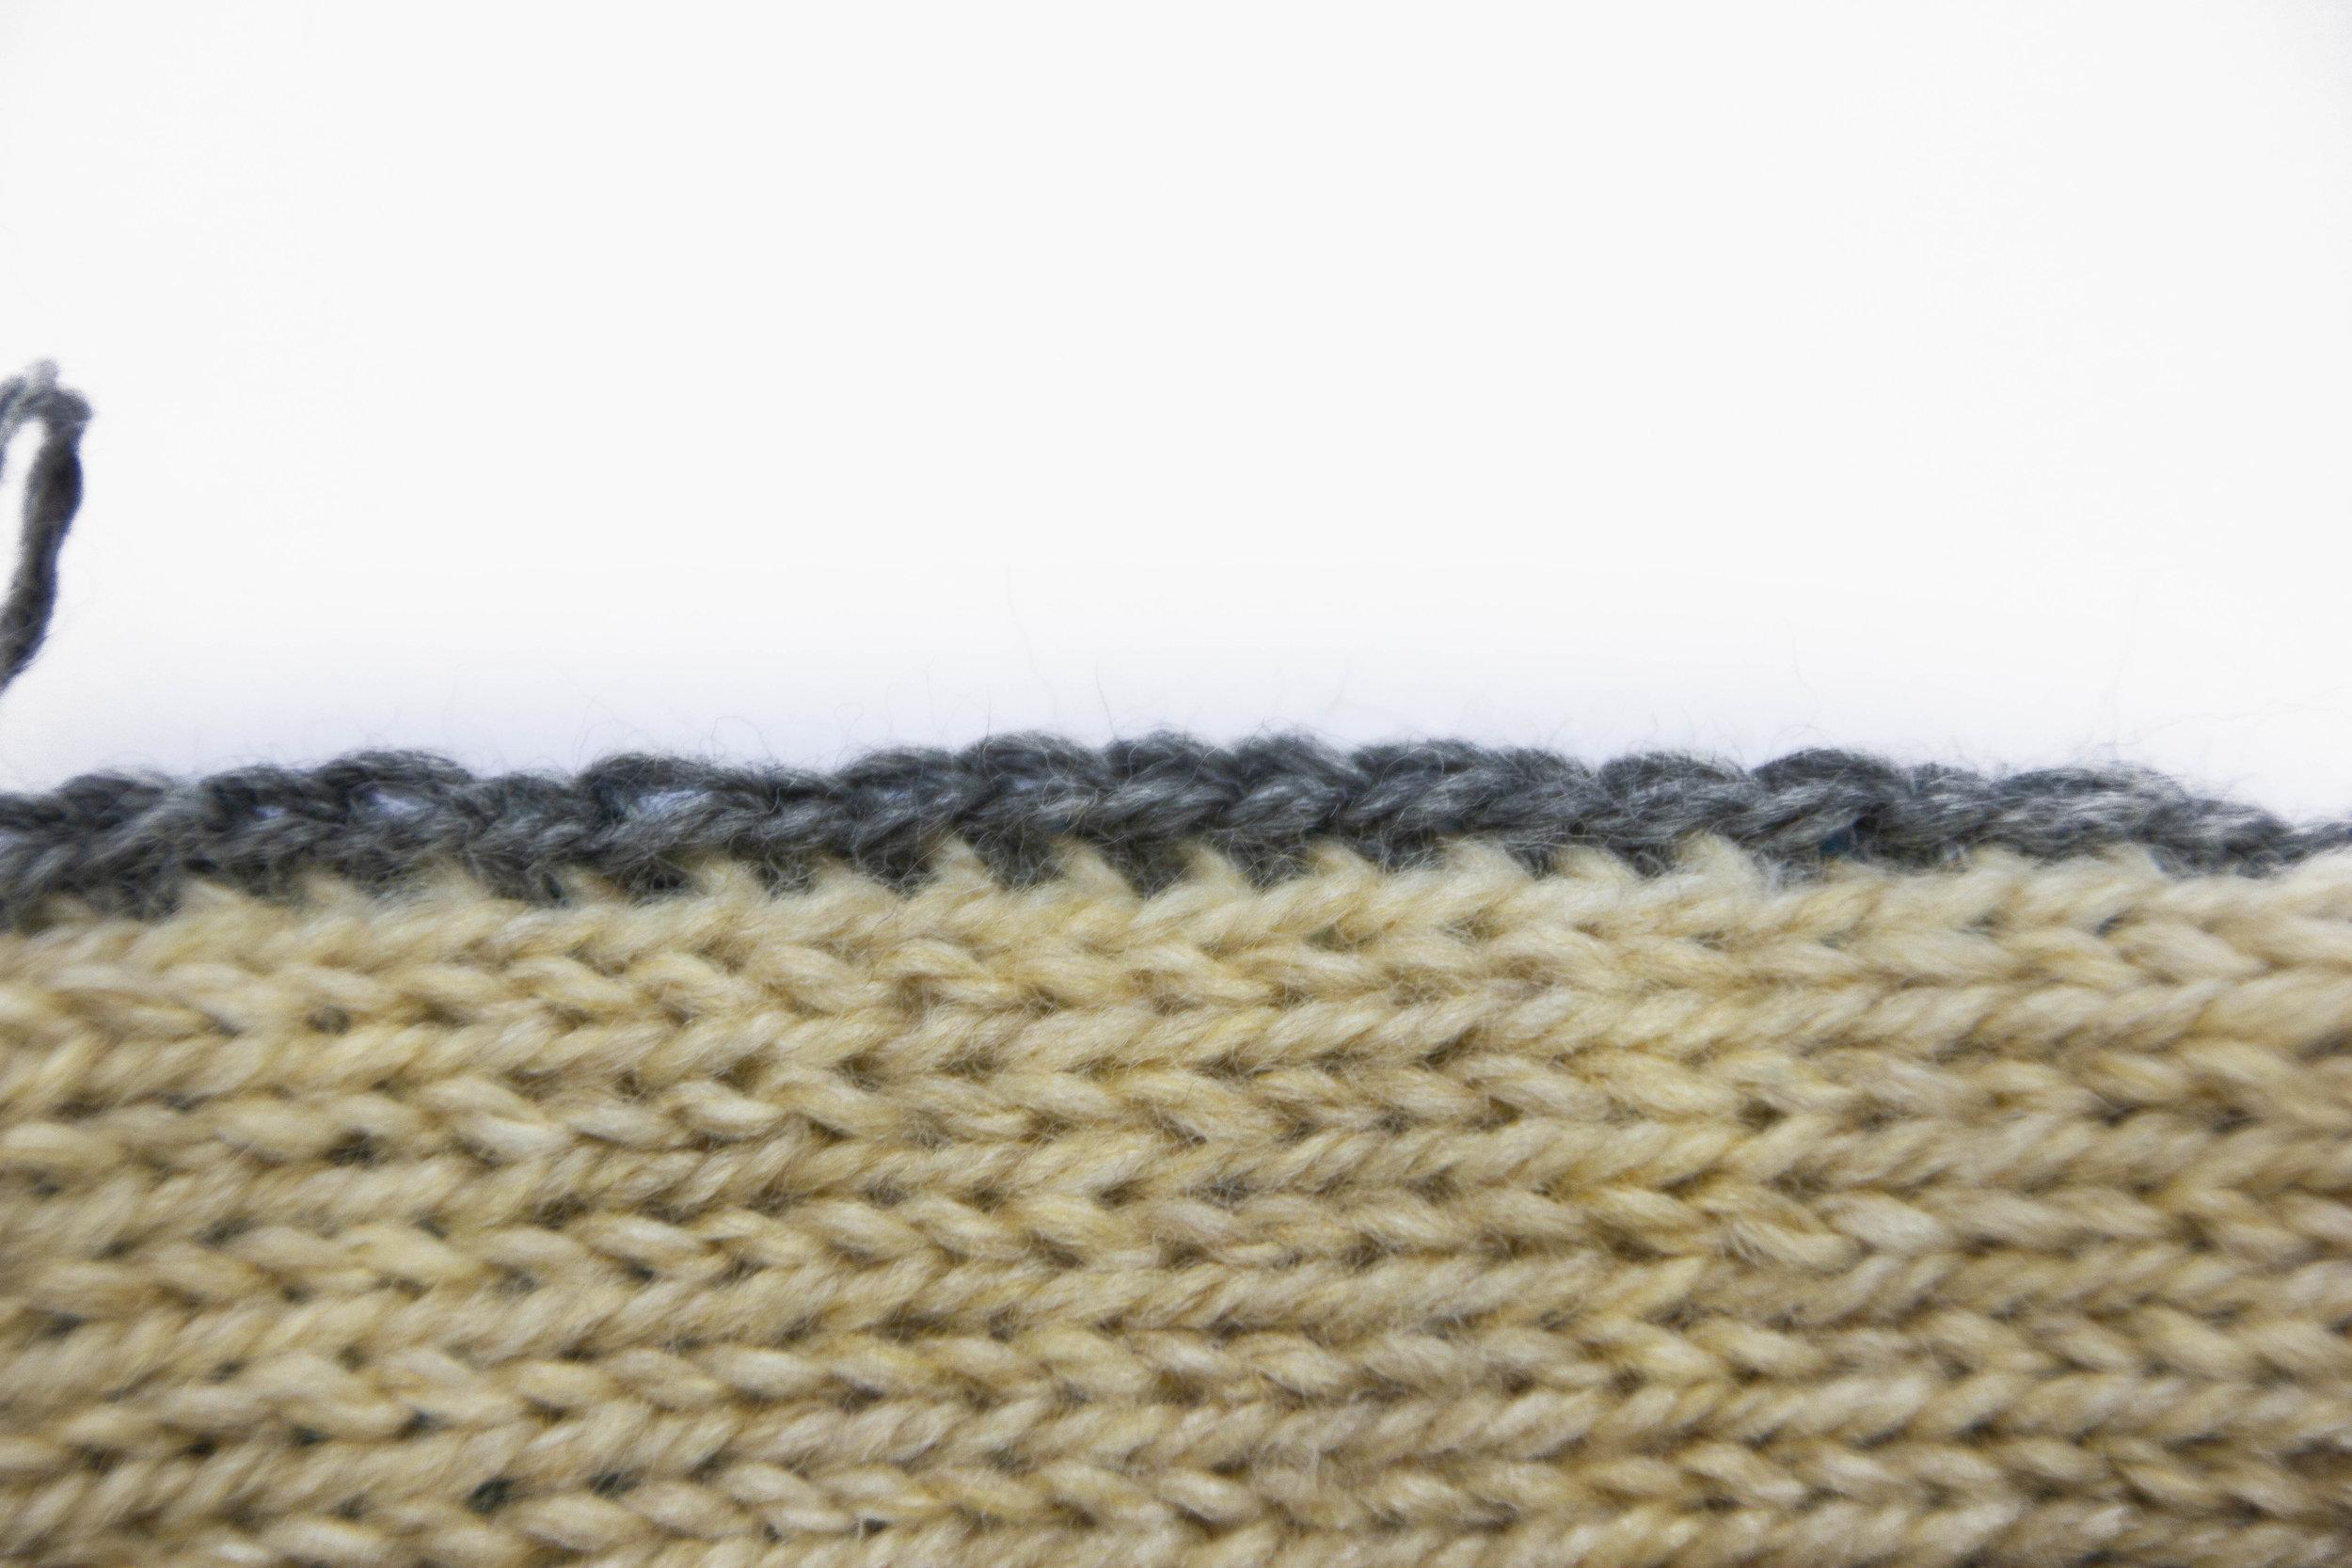 merele crochet steek 16.jpg